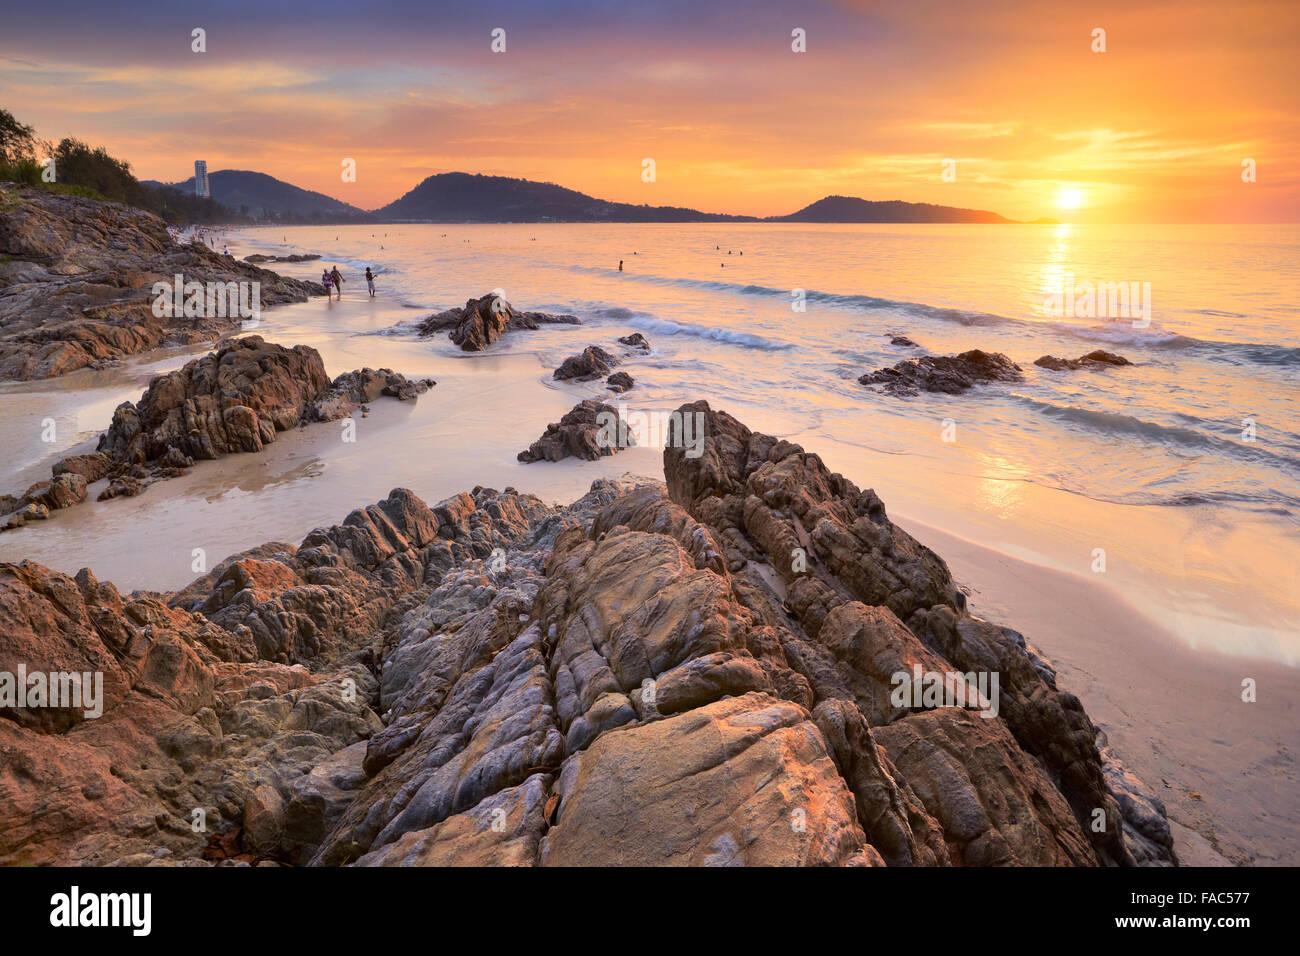 Thailand - Phuket Island, tropical Patong Beach at sunset time - Stock Image